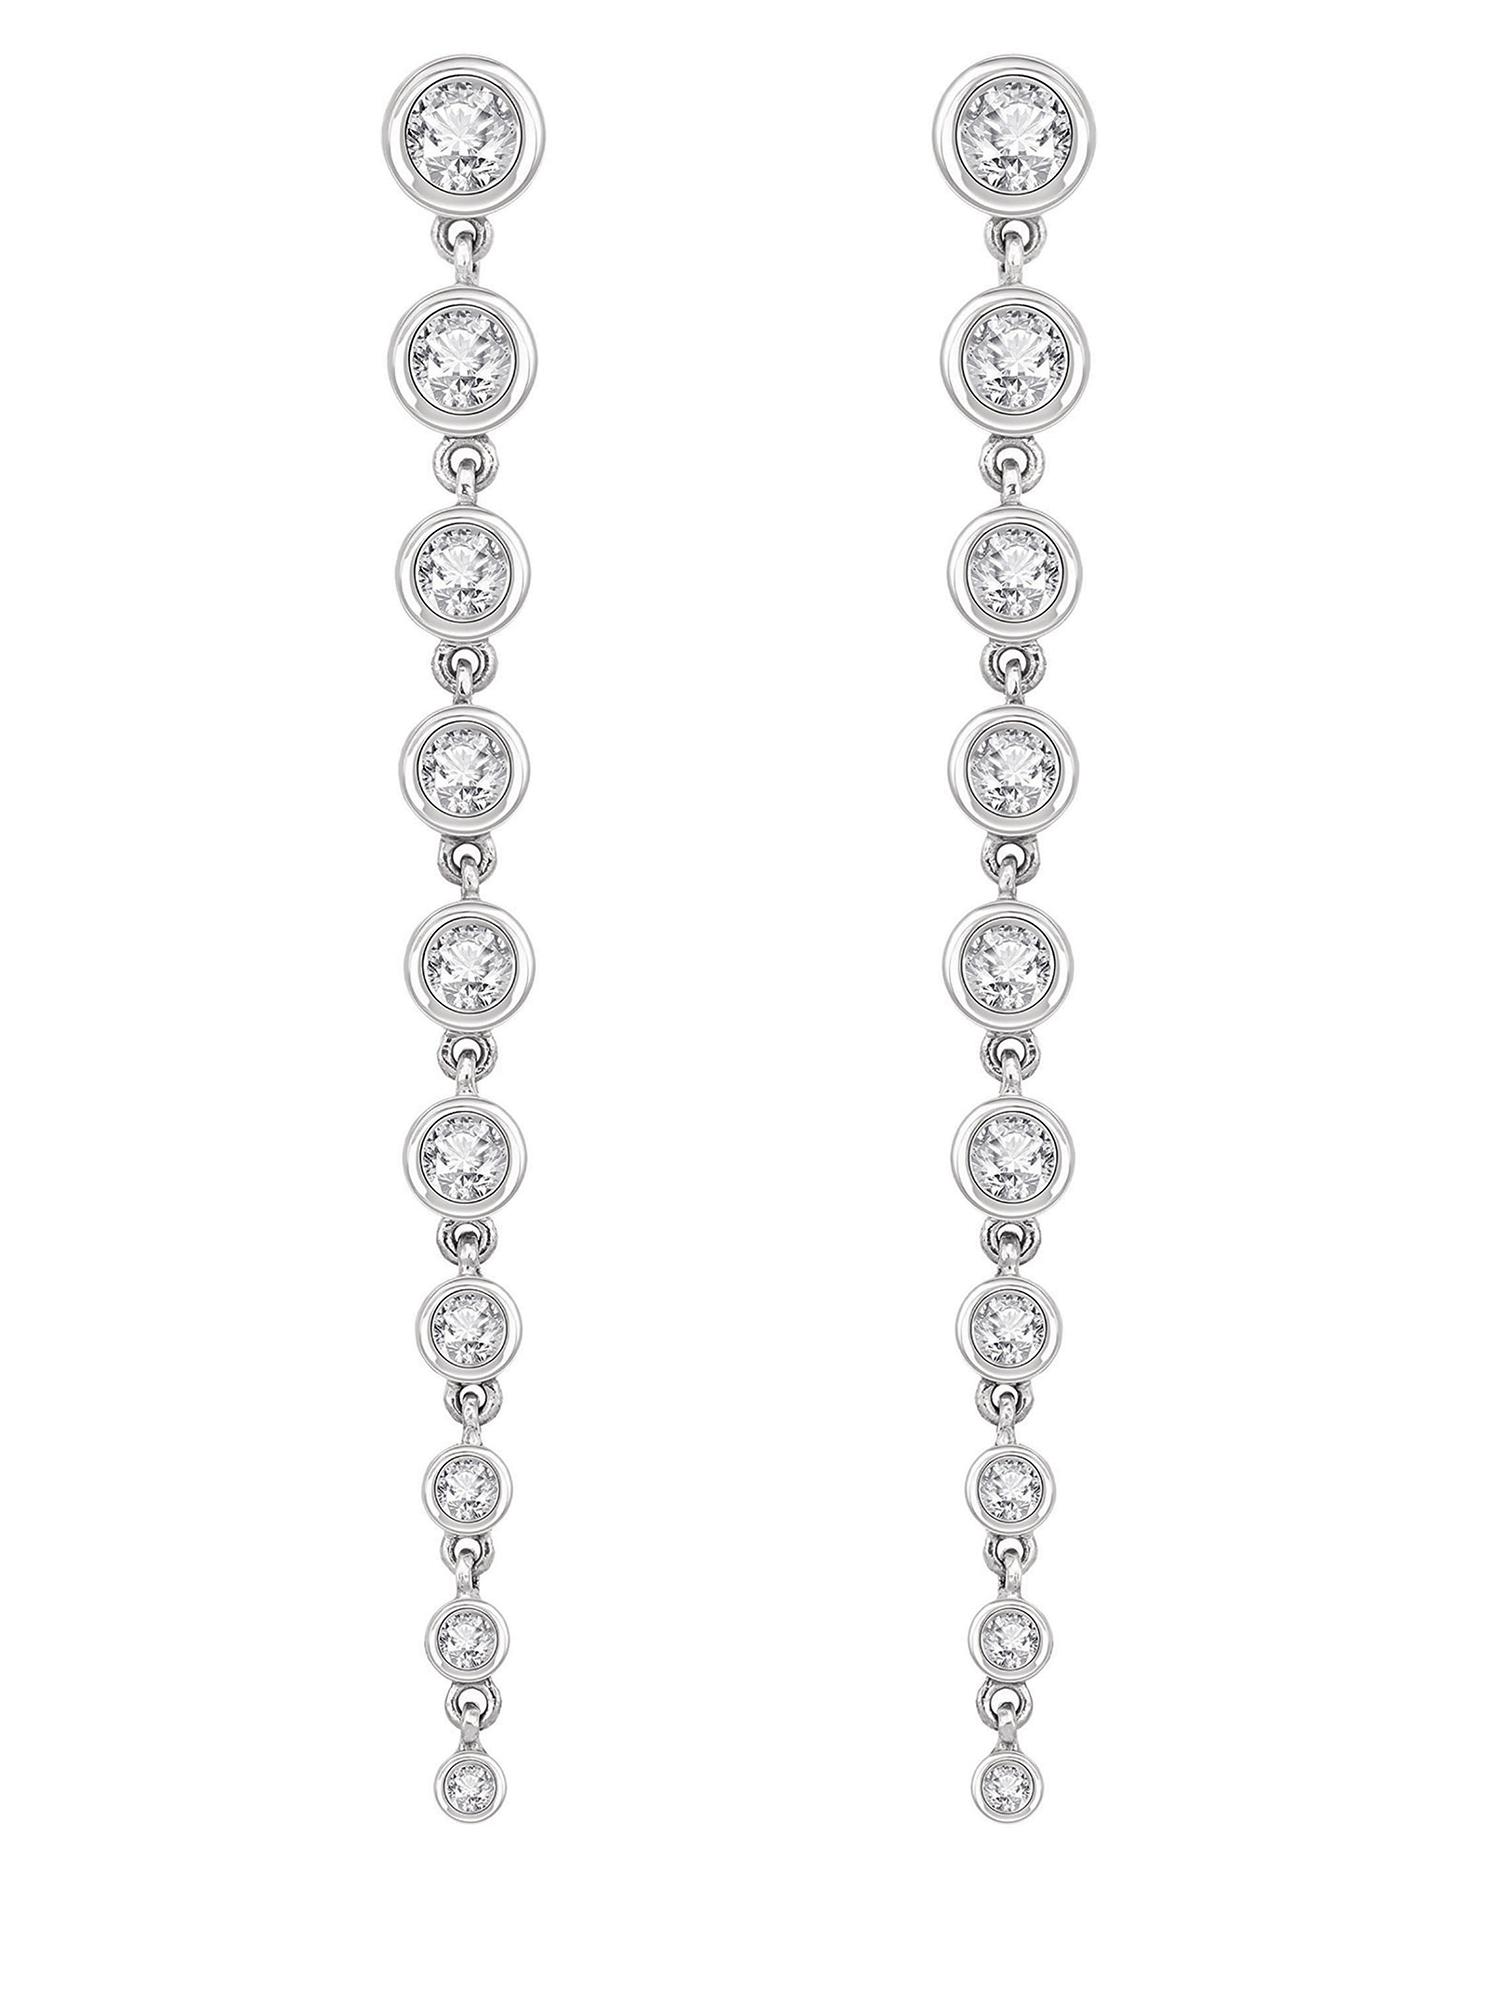 INSTORE Design Awards 2021 – Laboratory-Created Diamond and/or Gemstone Jewelry